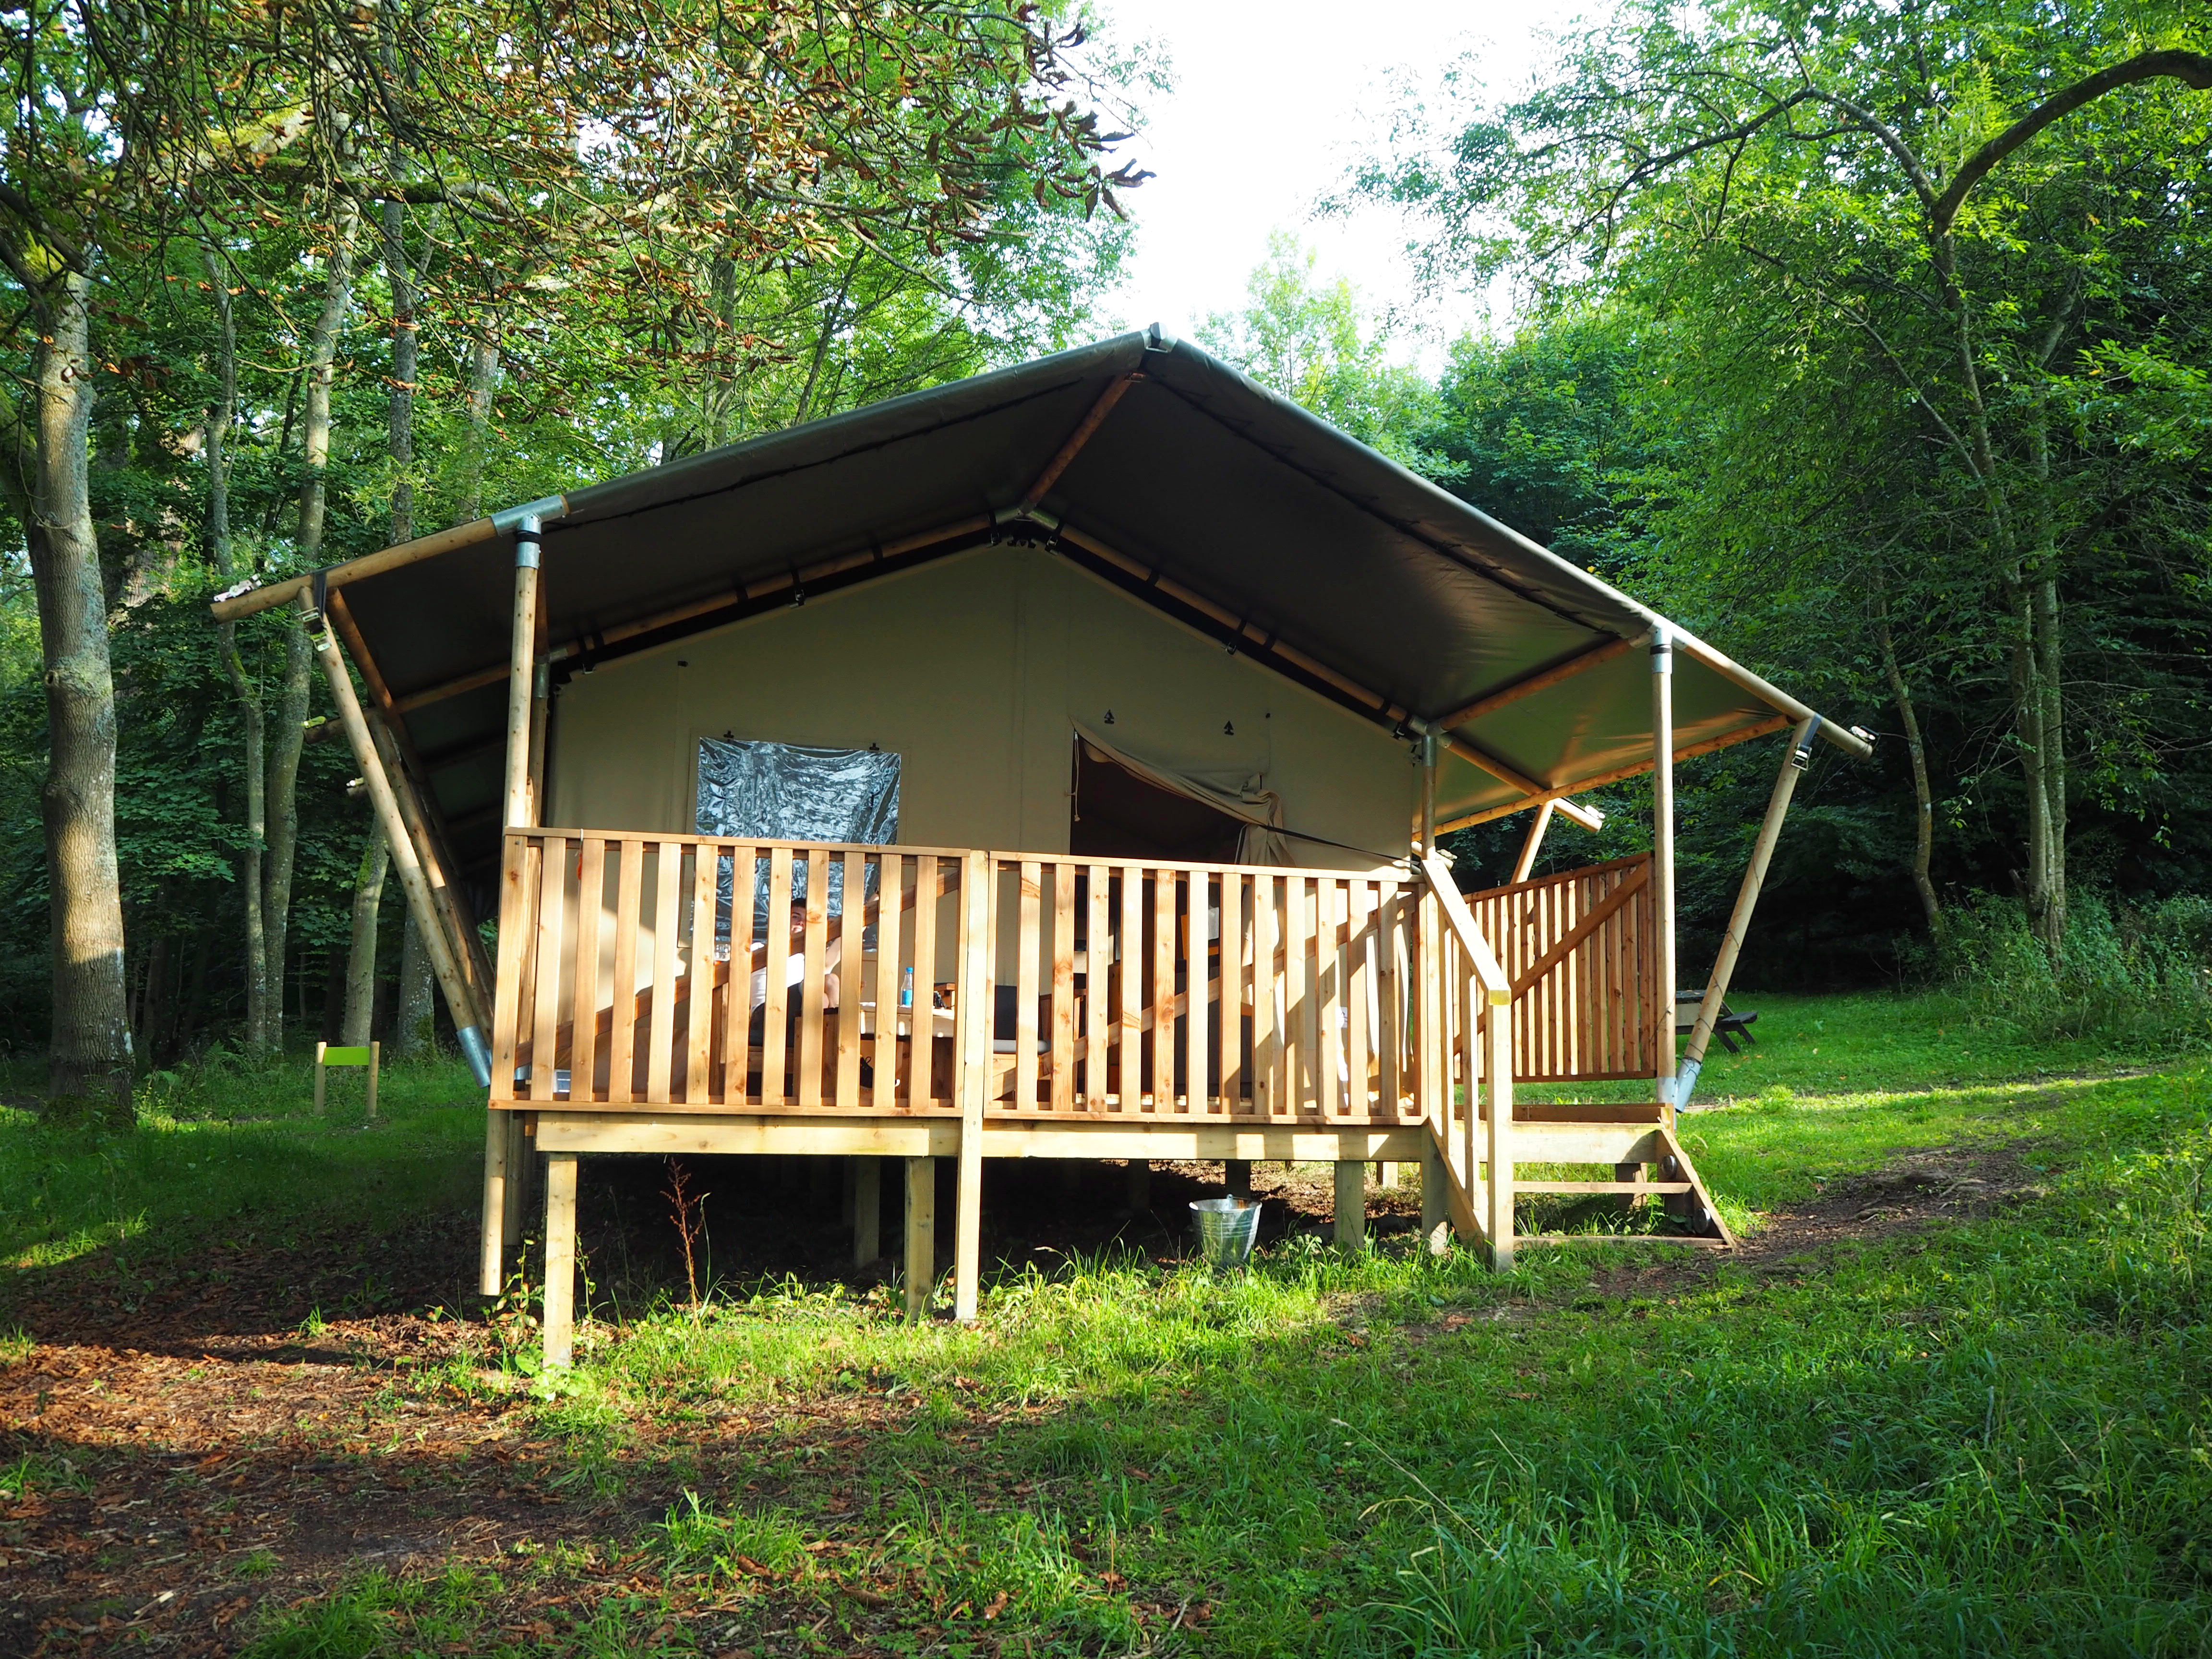 Safari Tent 1 at YHA Tanners Hatch